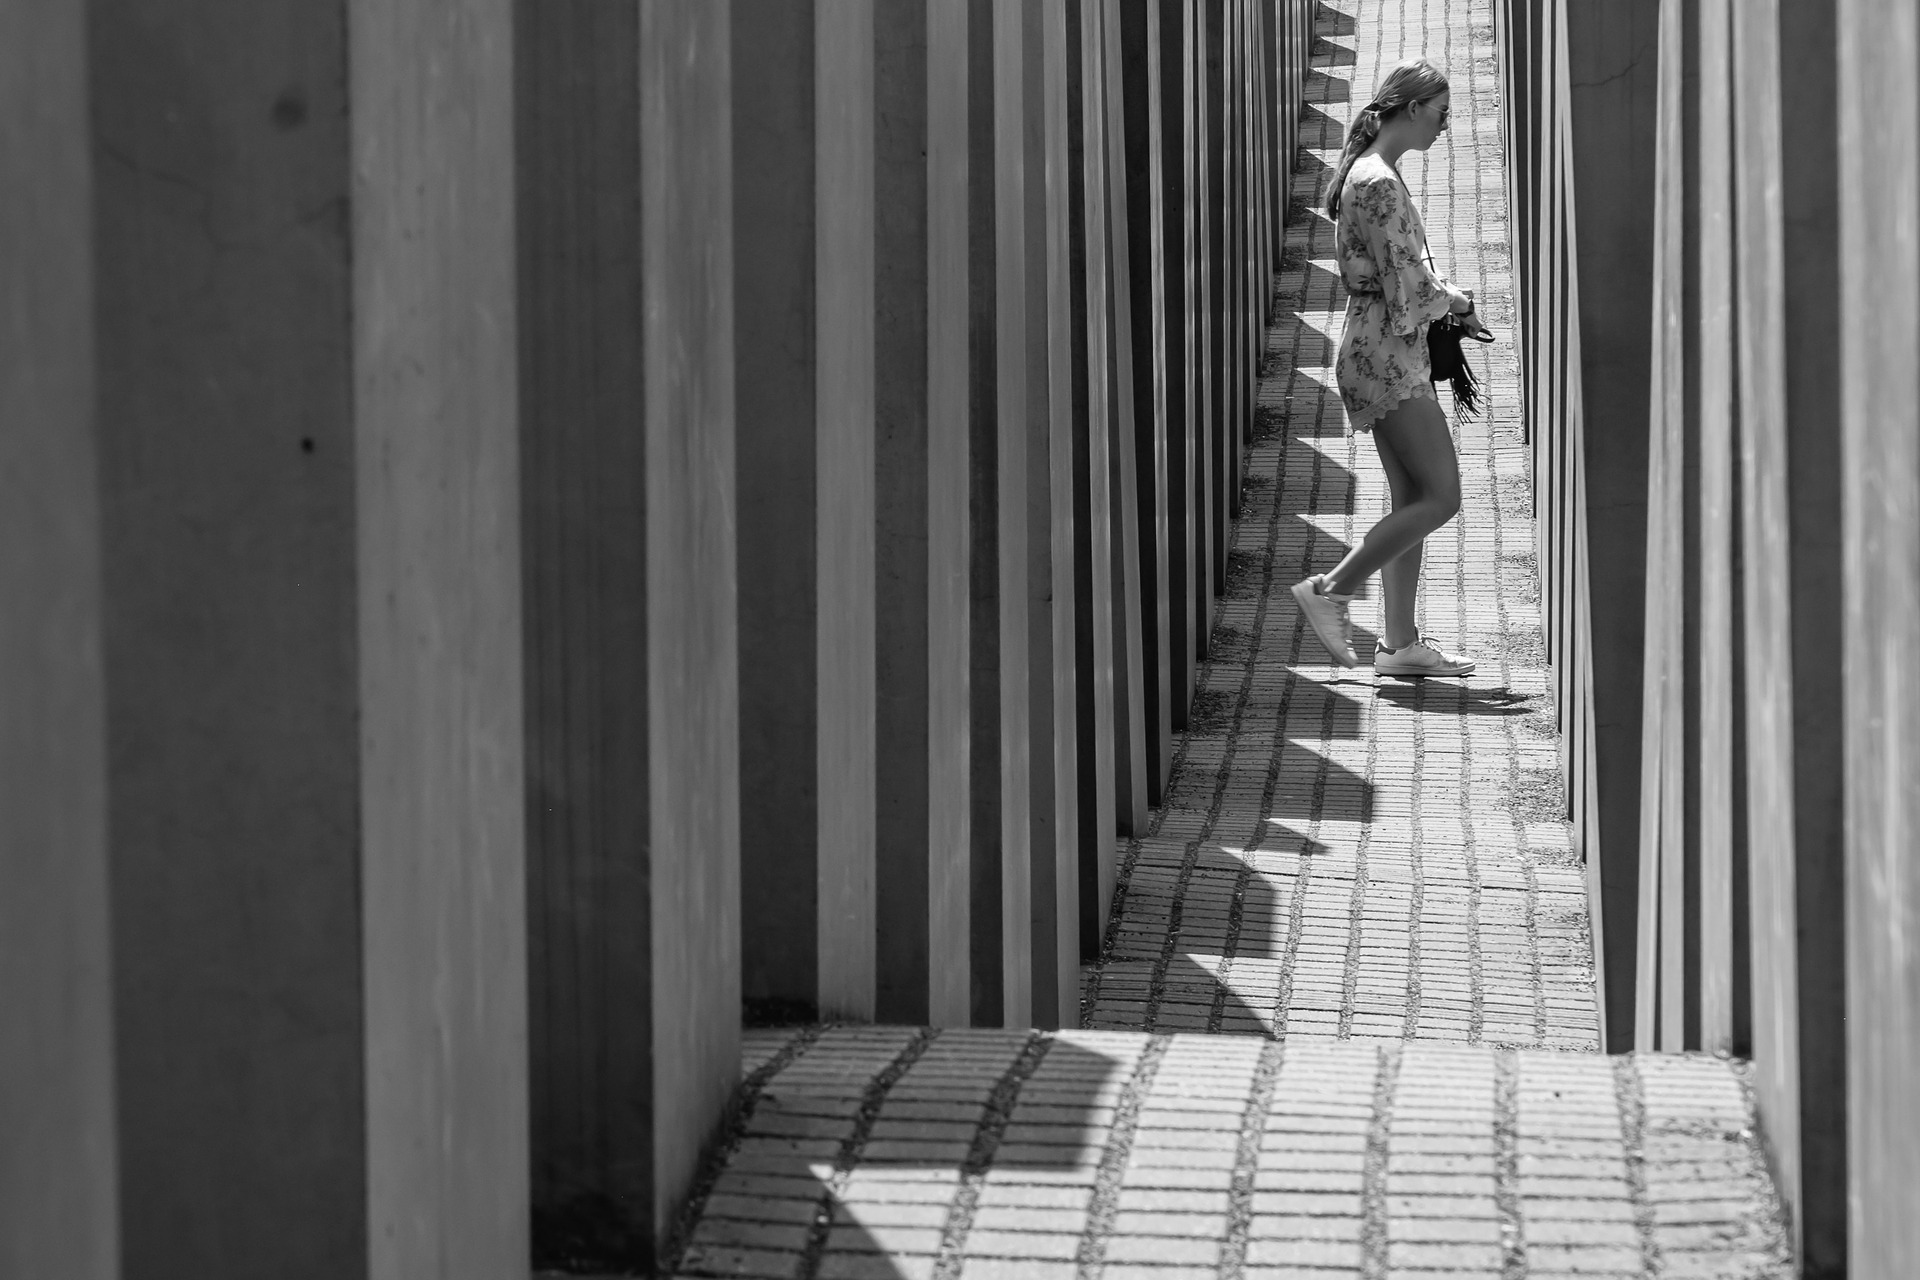 berlin-3523072_1920